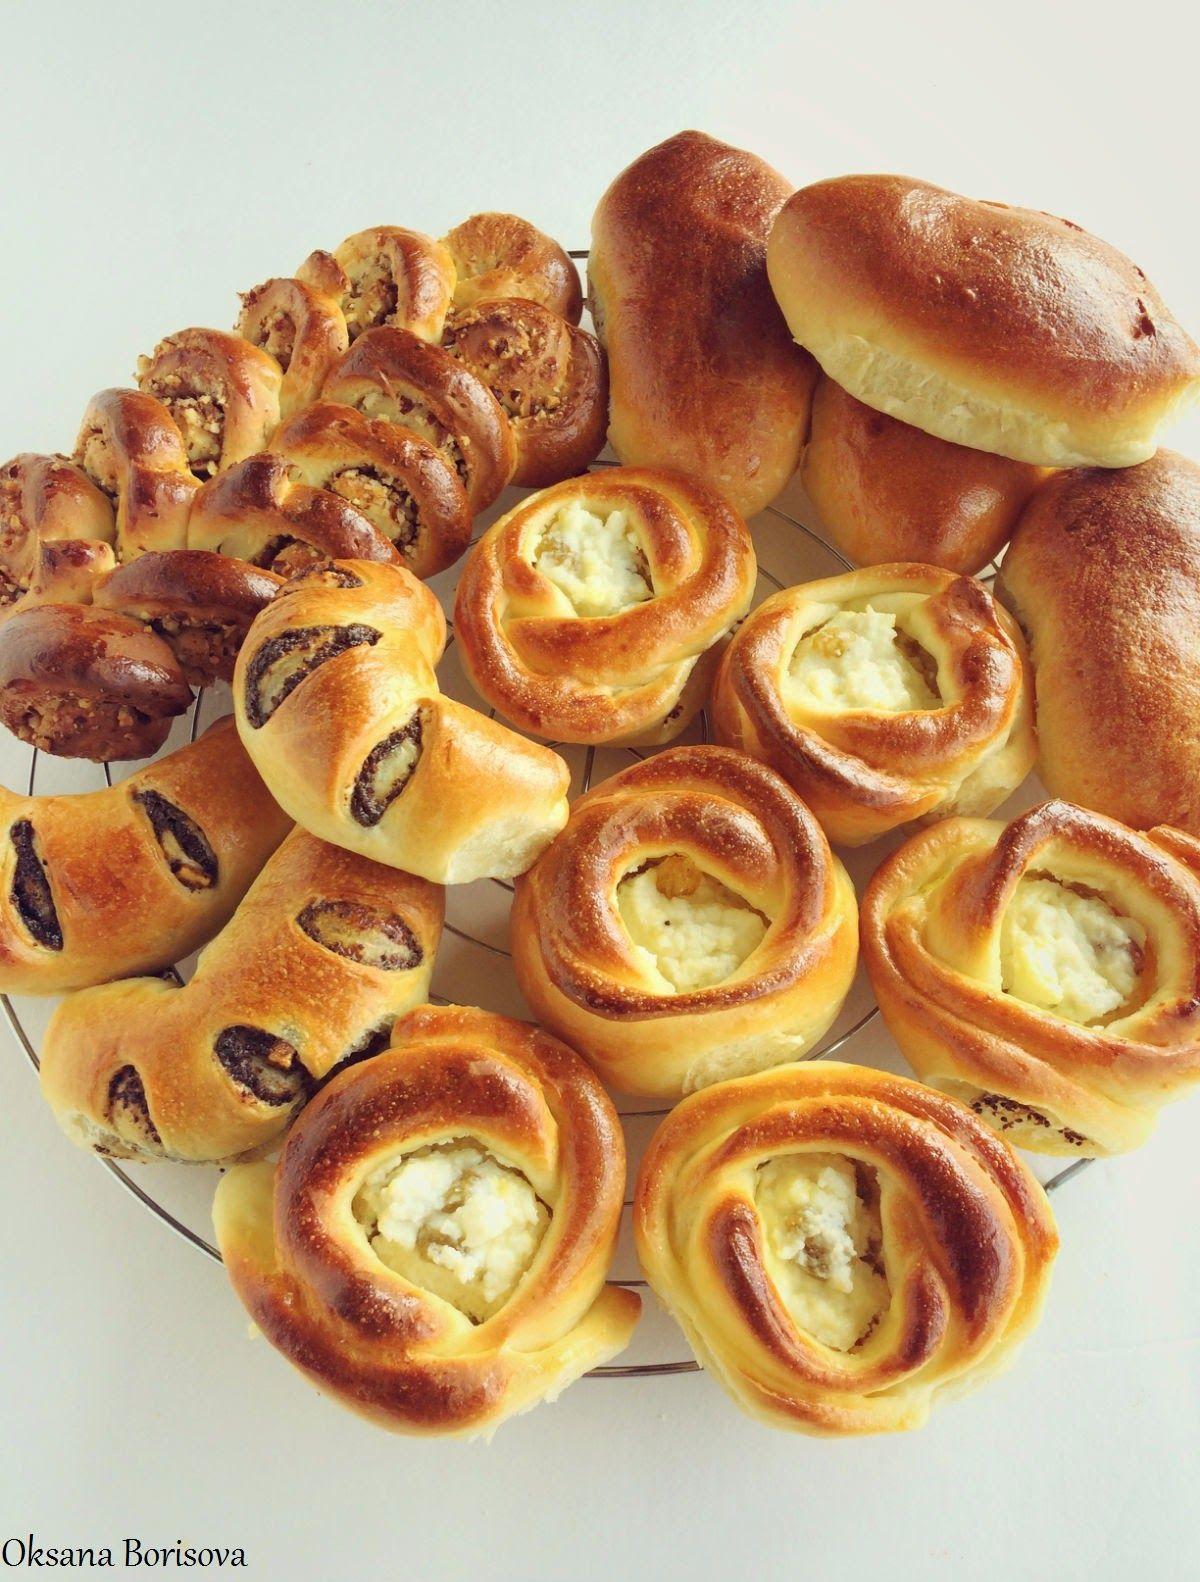 герба, рисунки пирожки и булочки интерьере